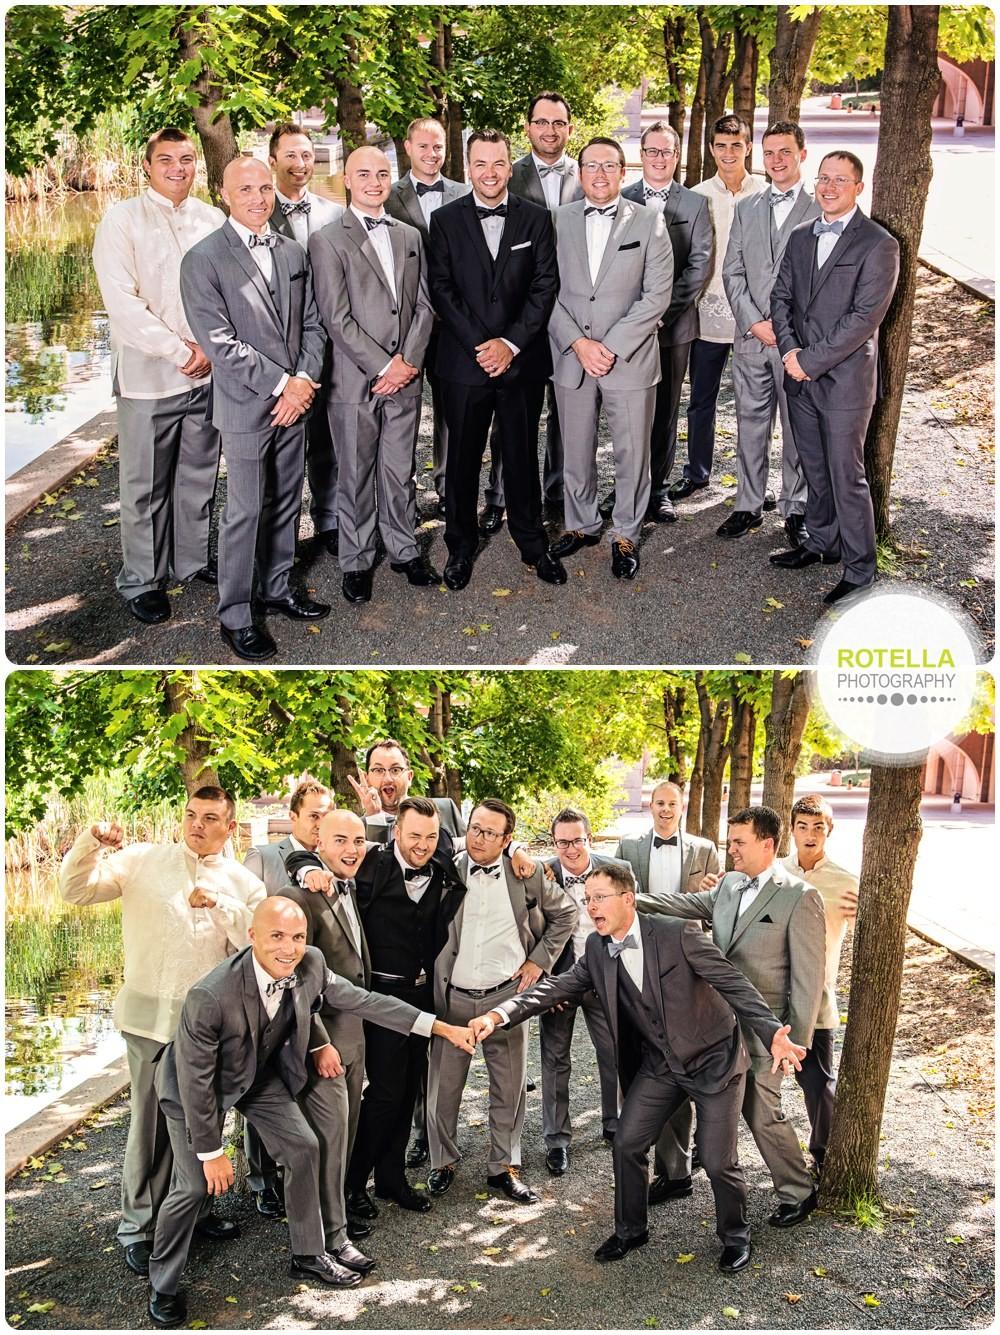 MELANIE-DEREK-MINNESOTA-WEDDING-PHOTOGRAPHY-ROTELLA-PHOTOGRAPHY_2015-05